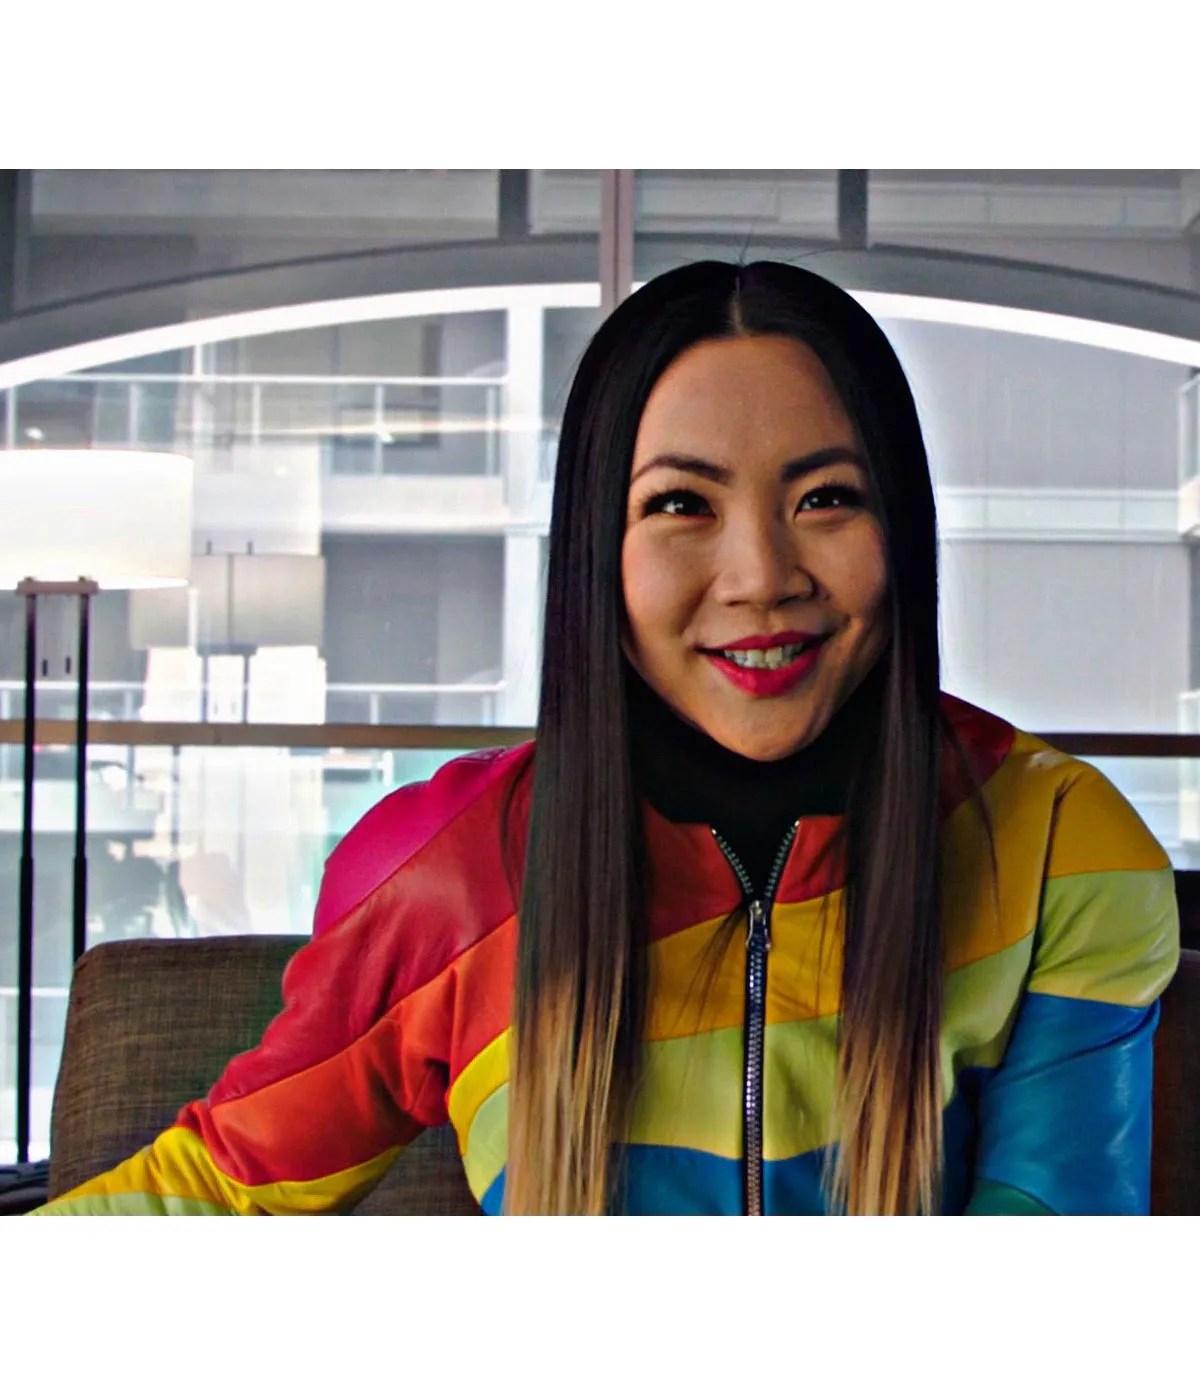 jona-xiao-the-flash-s07-carrie-bates-jacket